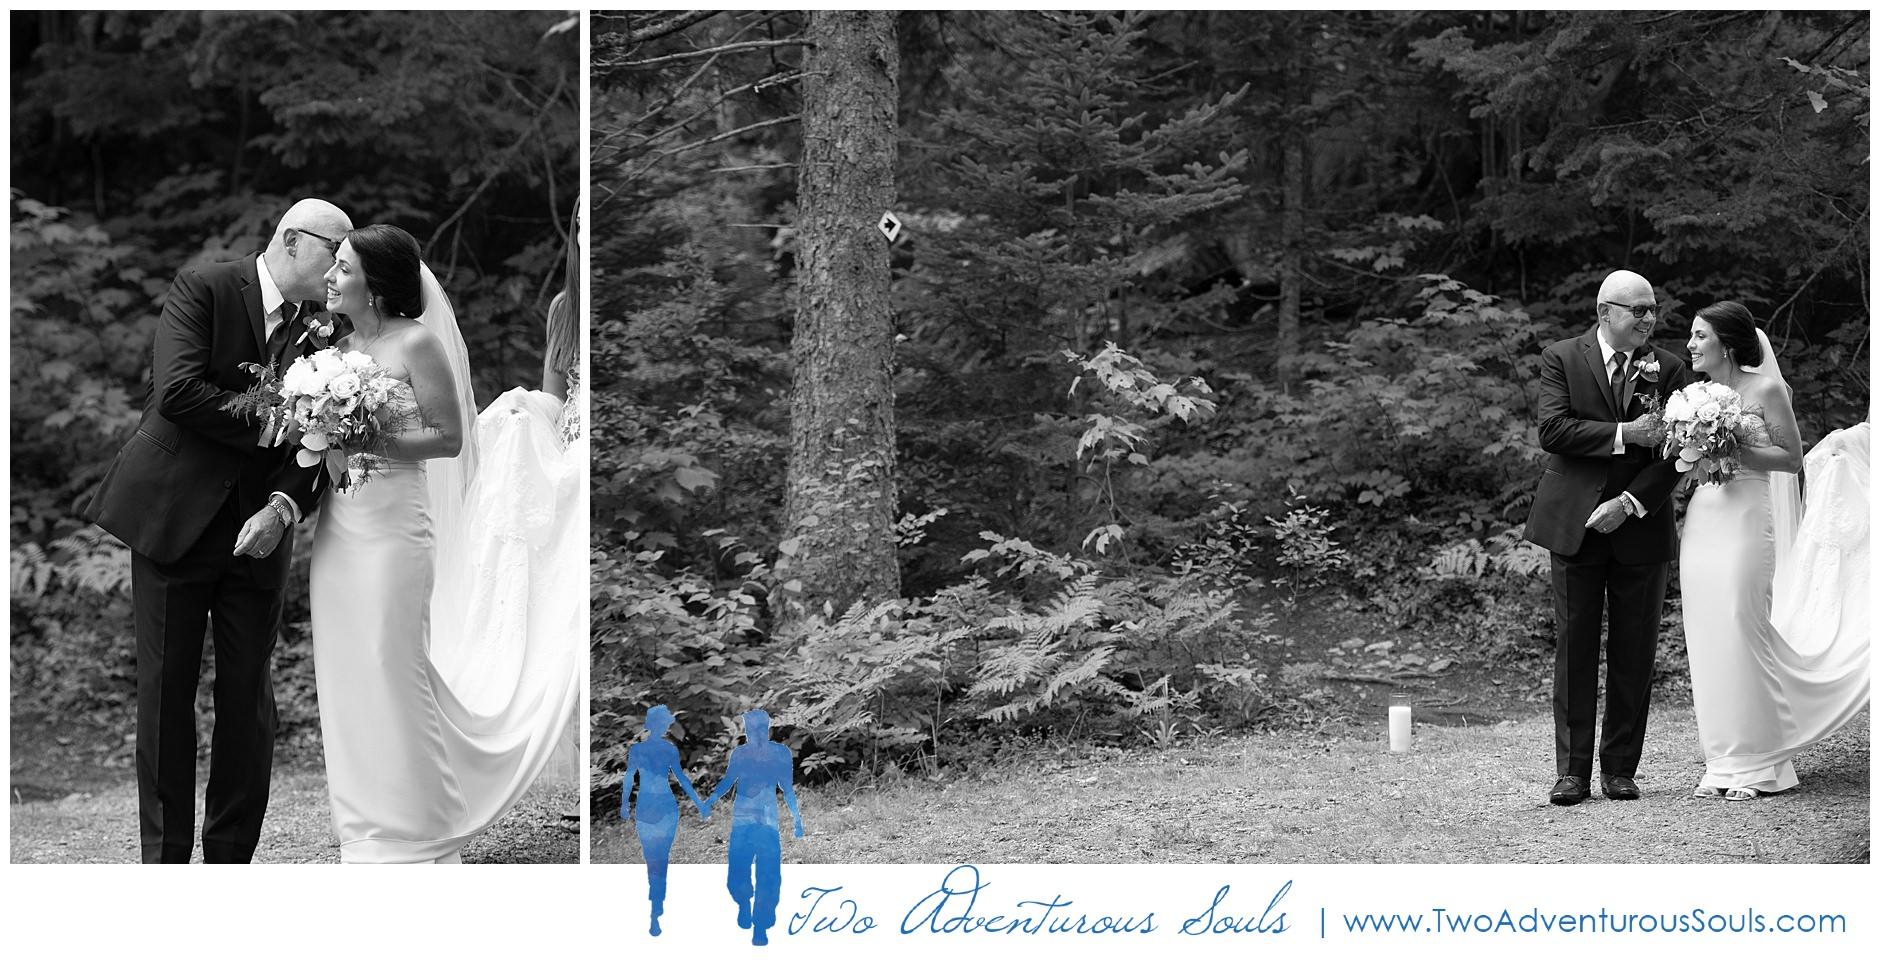 Sugarloaf Outdoor Center Wedding Photographers, Destination Wedding Photographers, Two Adventurous Souls-081719_0033.jpg